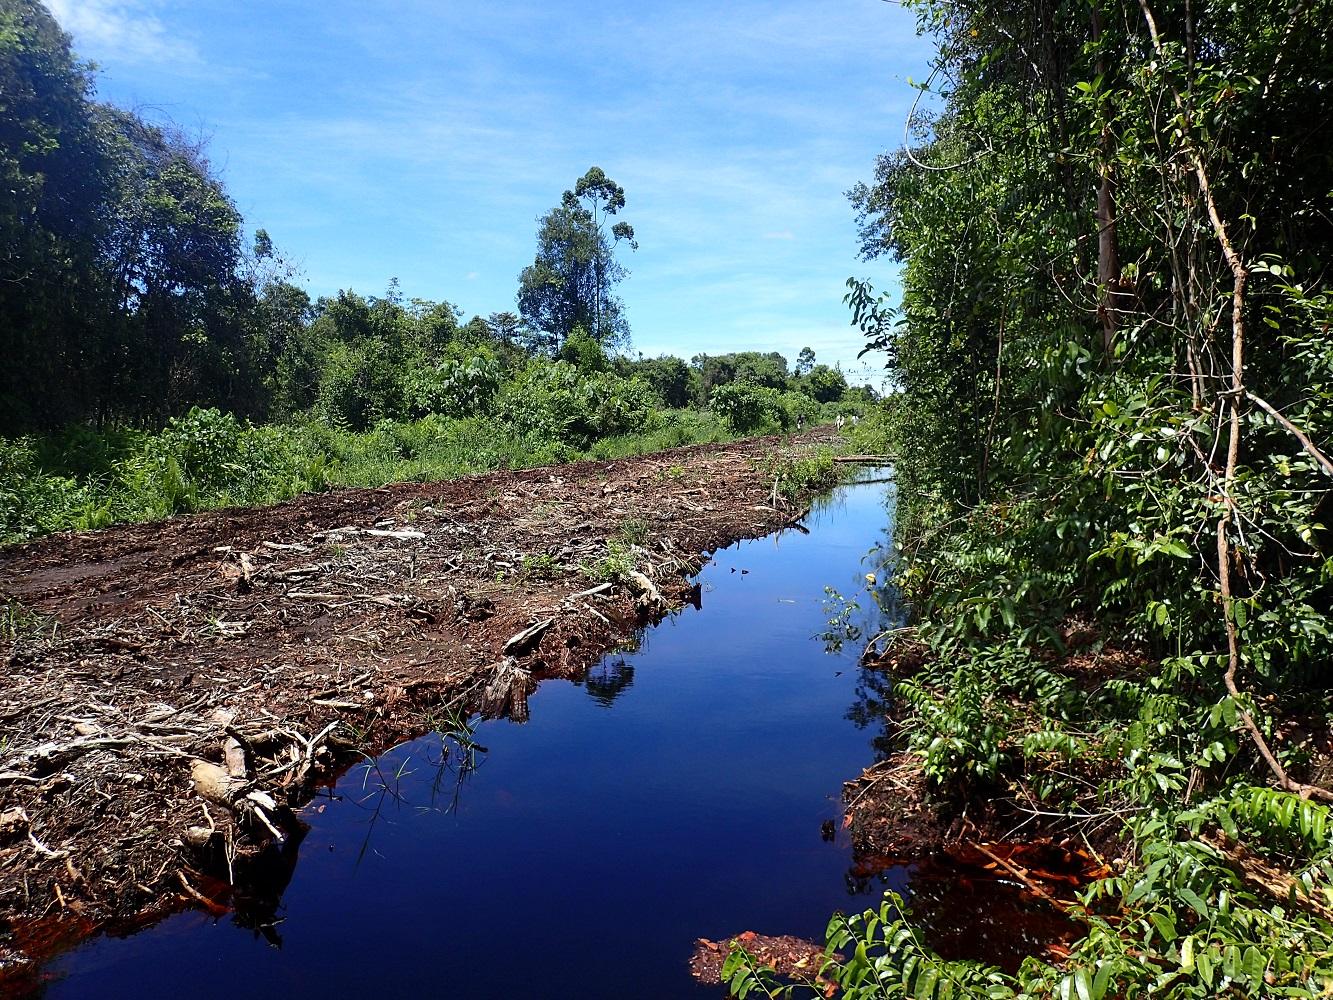 Oil Palm Plantation Road and Draingage in Sarawark Malaysia